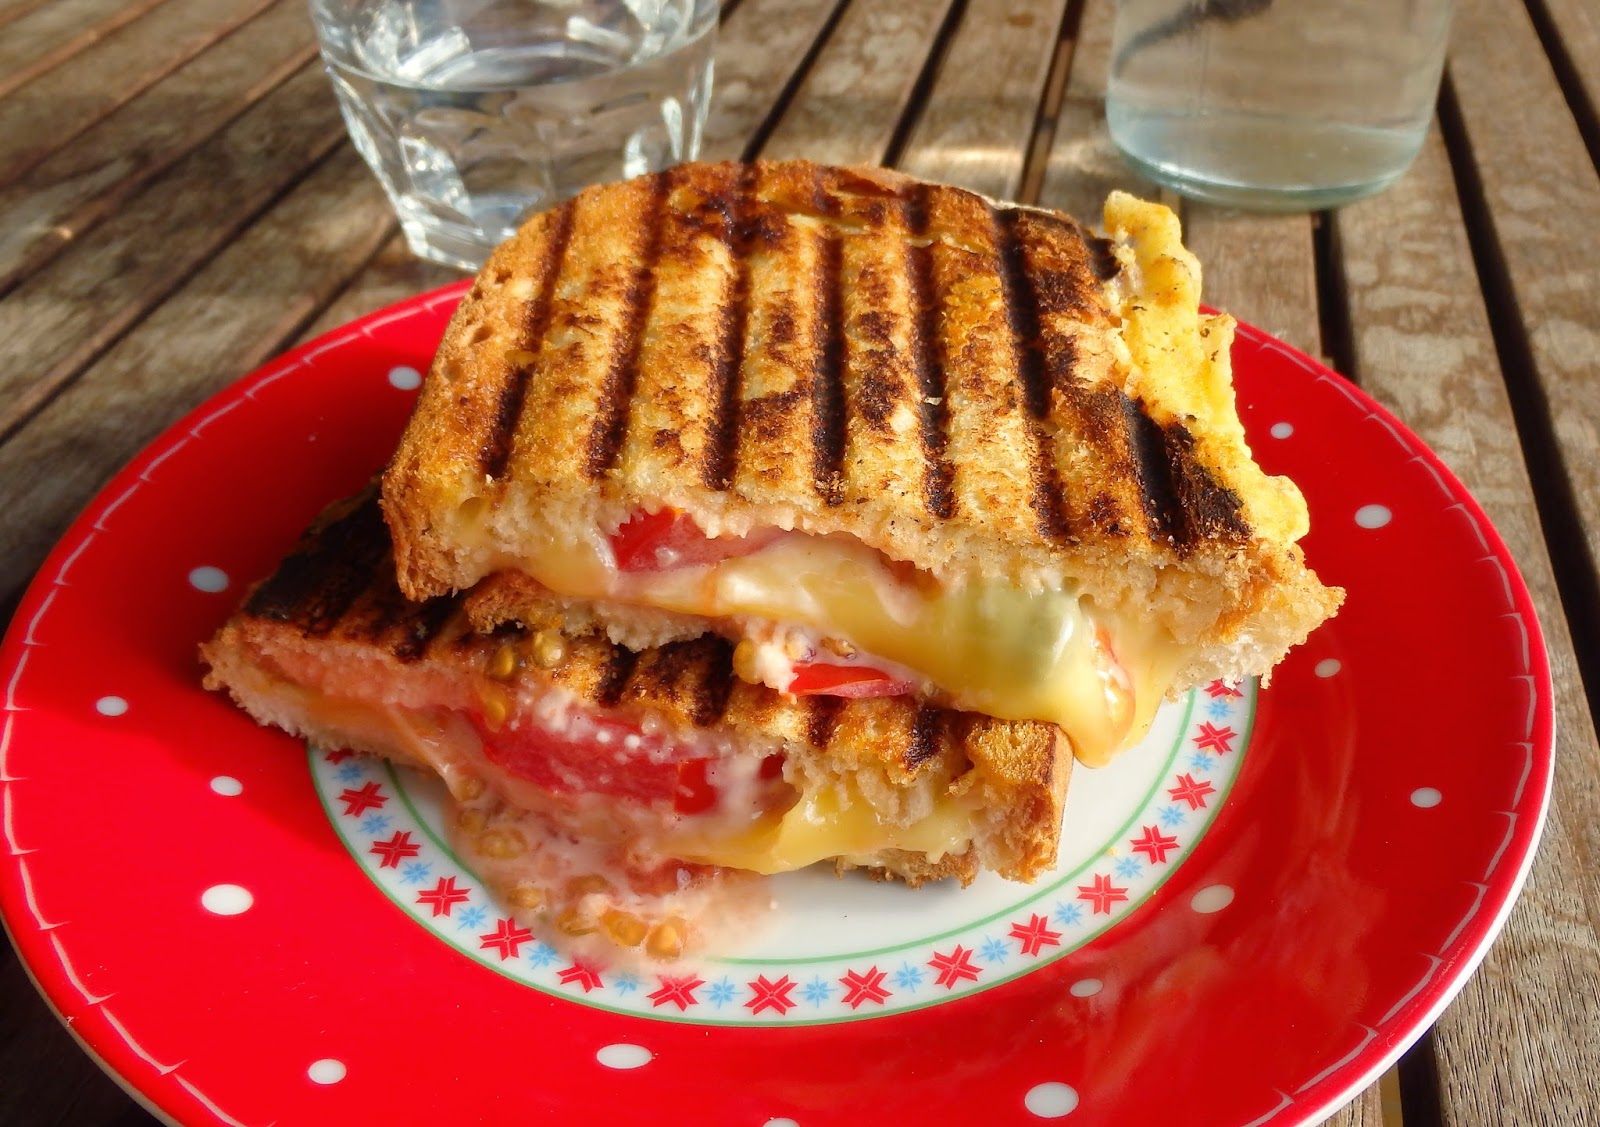 Sandwich de queso y tomate